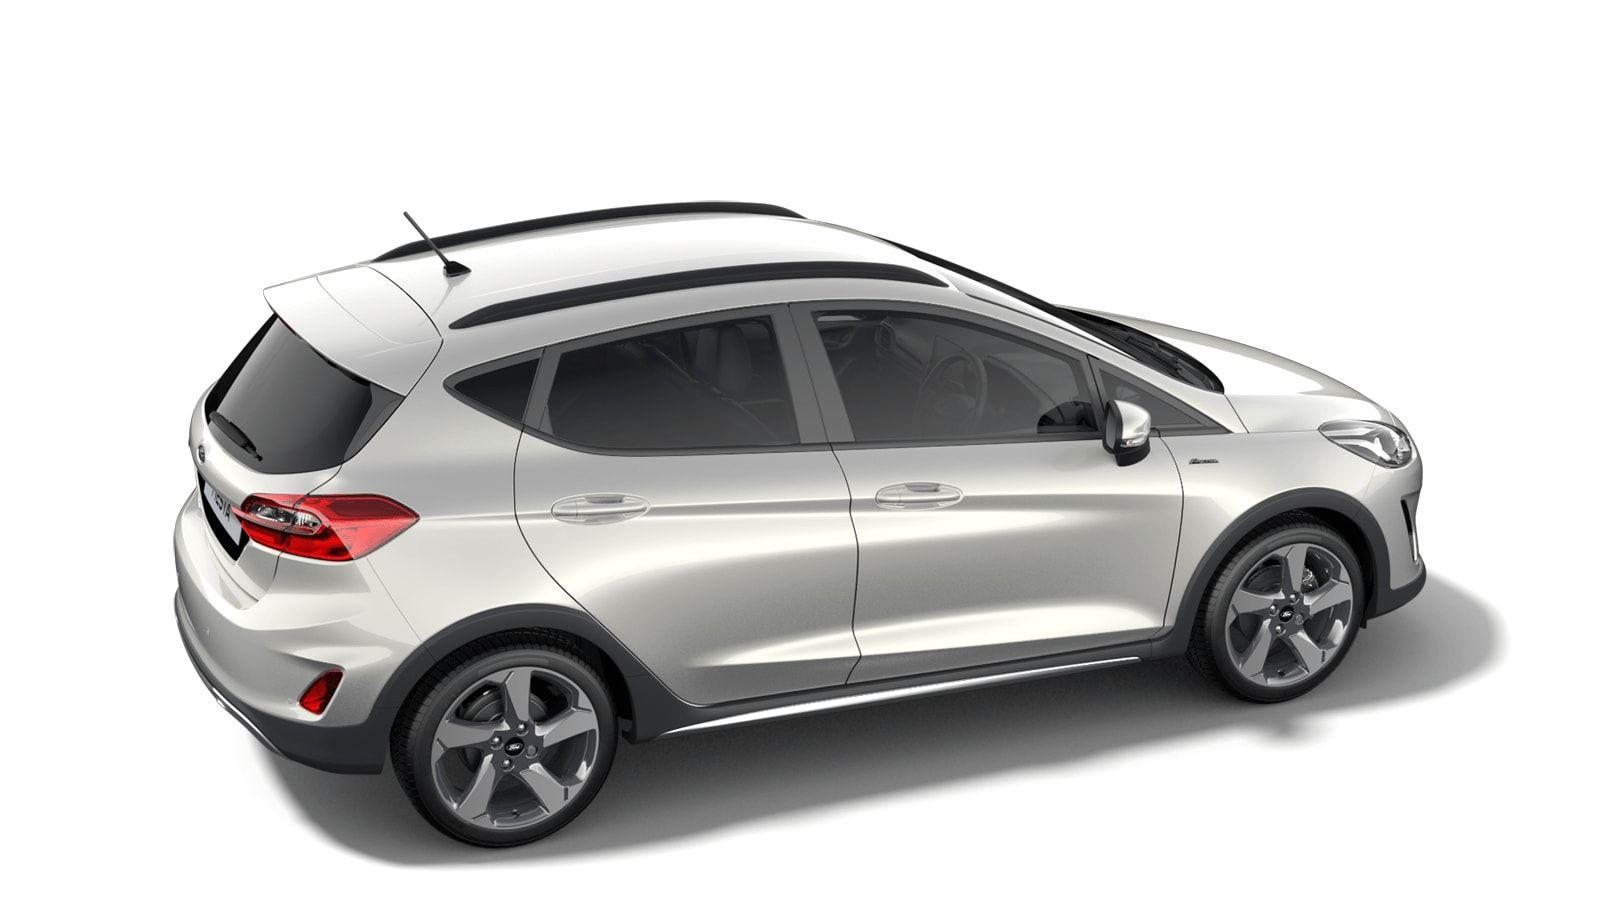 "Nieuw Ford All-new ford fiesta Active 1.0i EcoBoost mHEV 125ps / 92kW M6 - 5d JKV - Speciale metaalkleur ""Metropolis White"" 3"